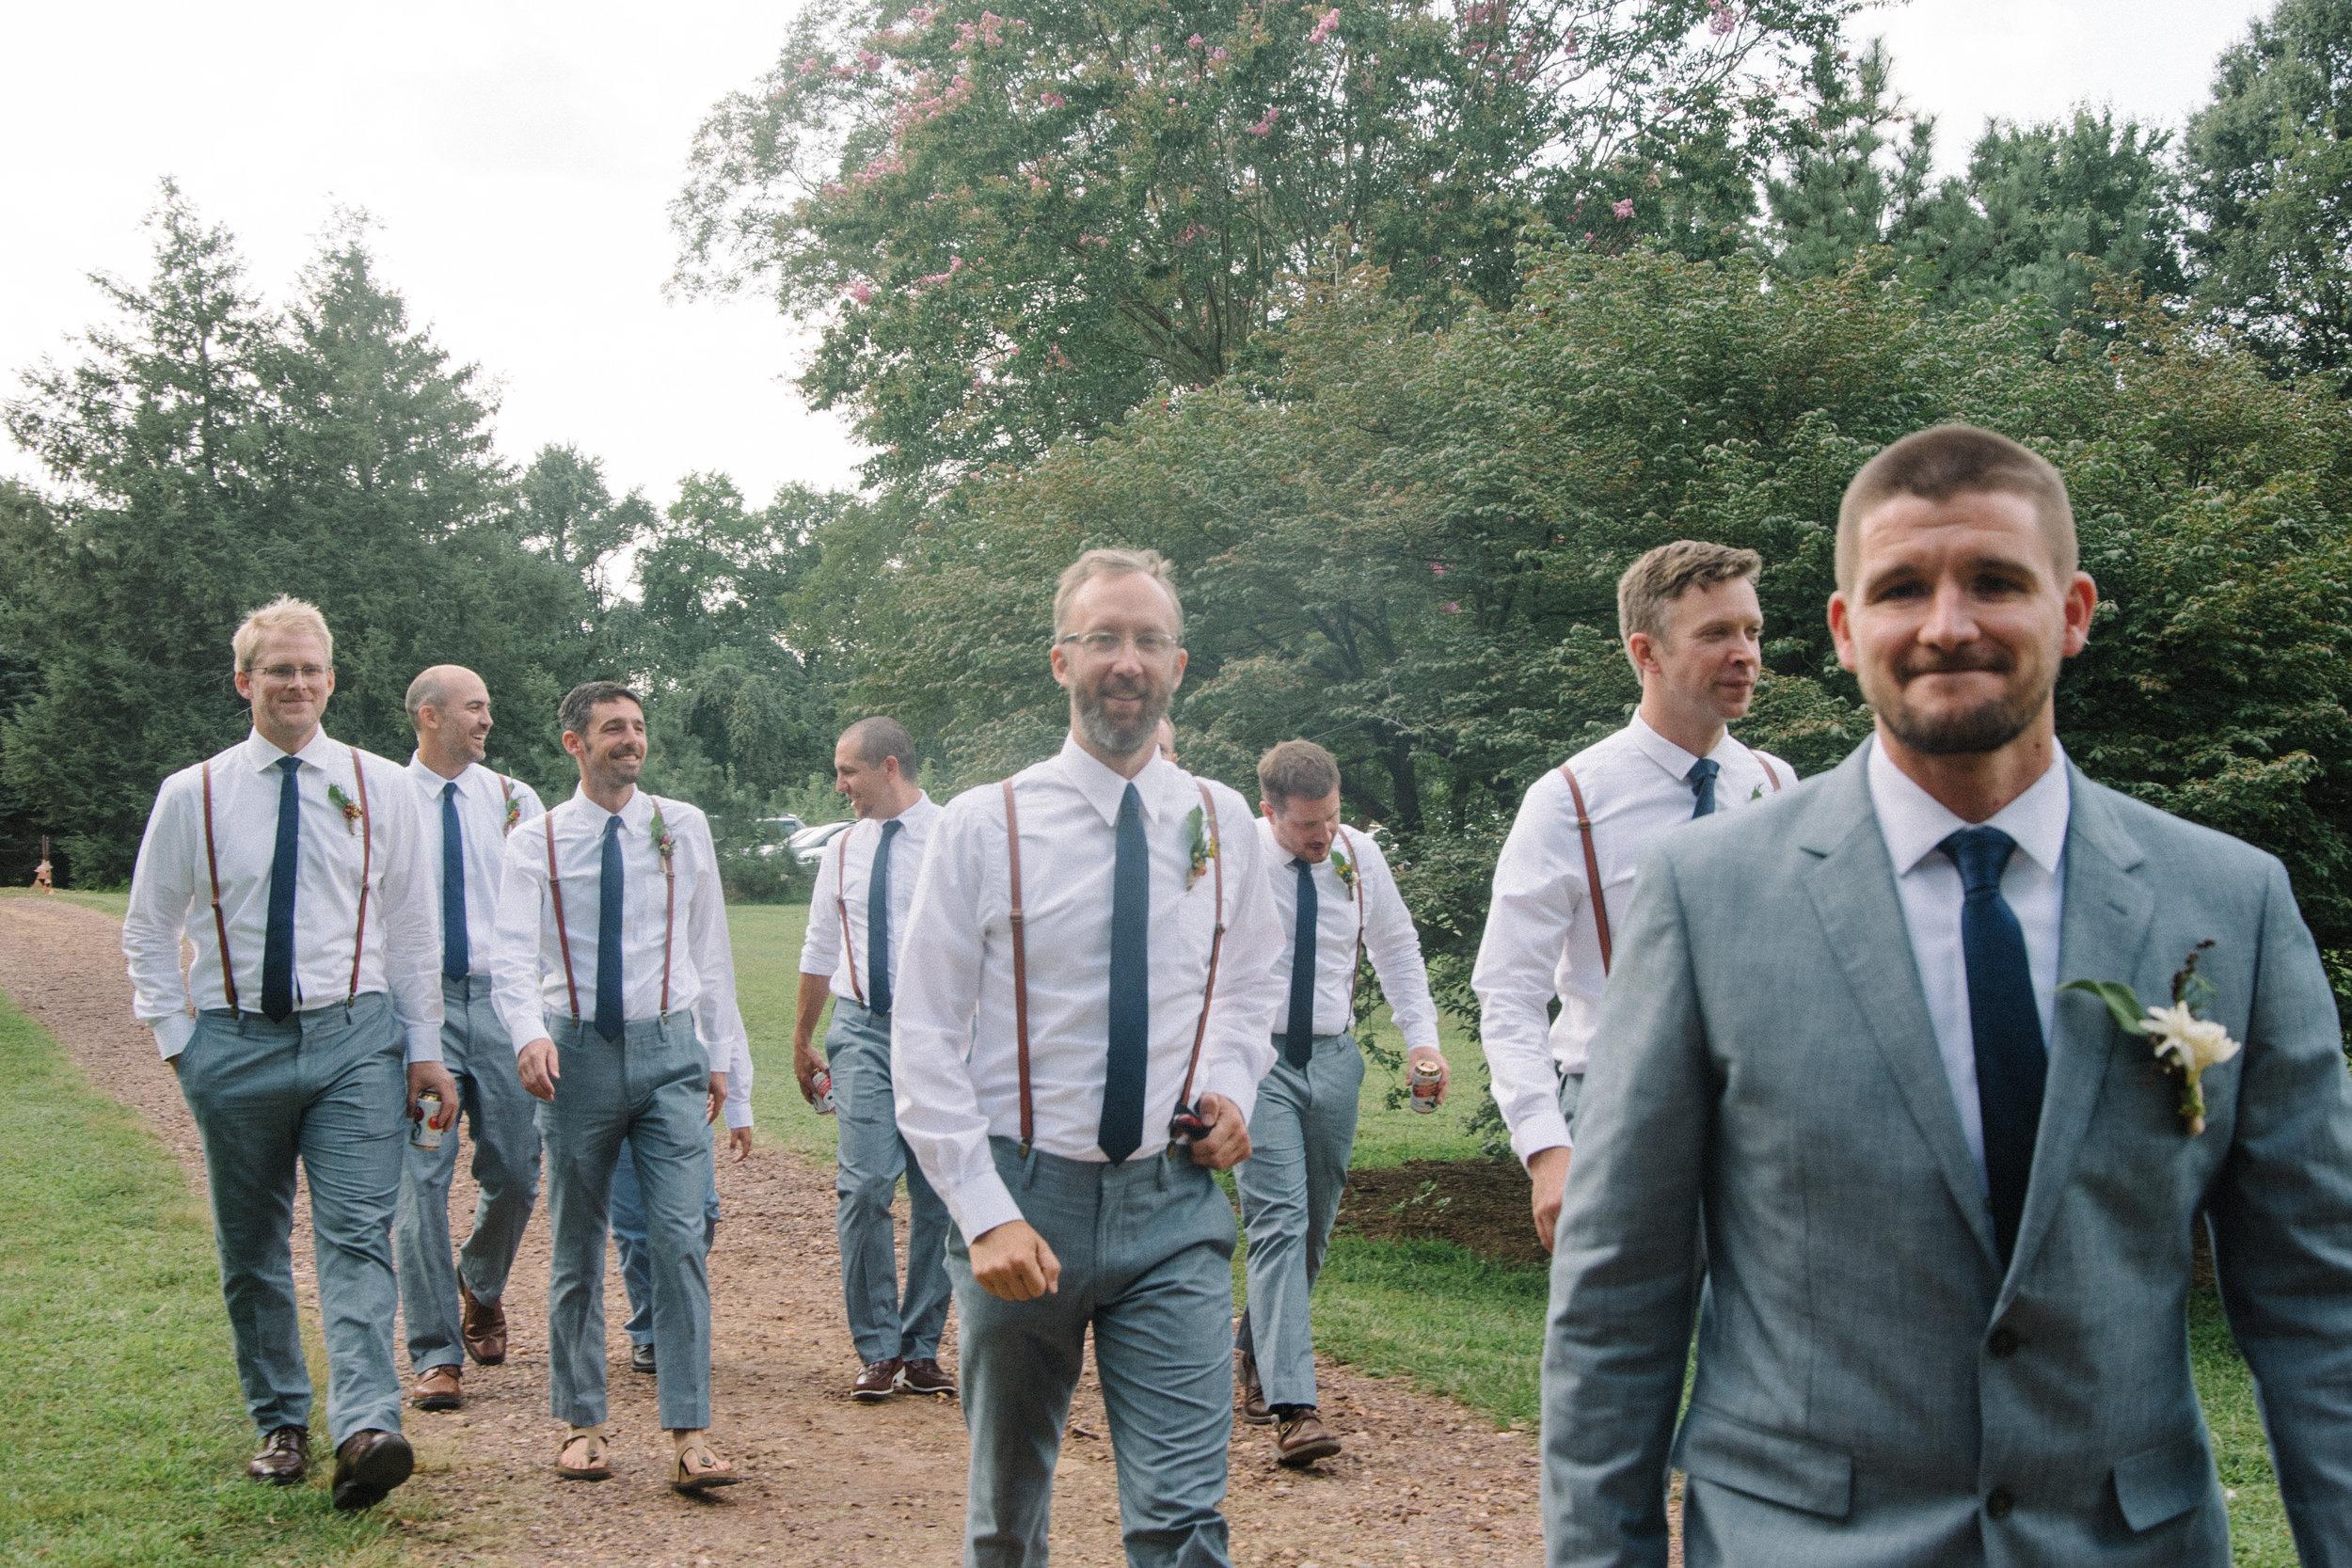 wedding on the chester river-17.jpg